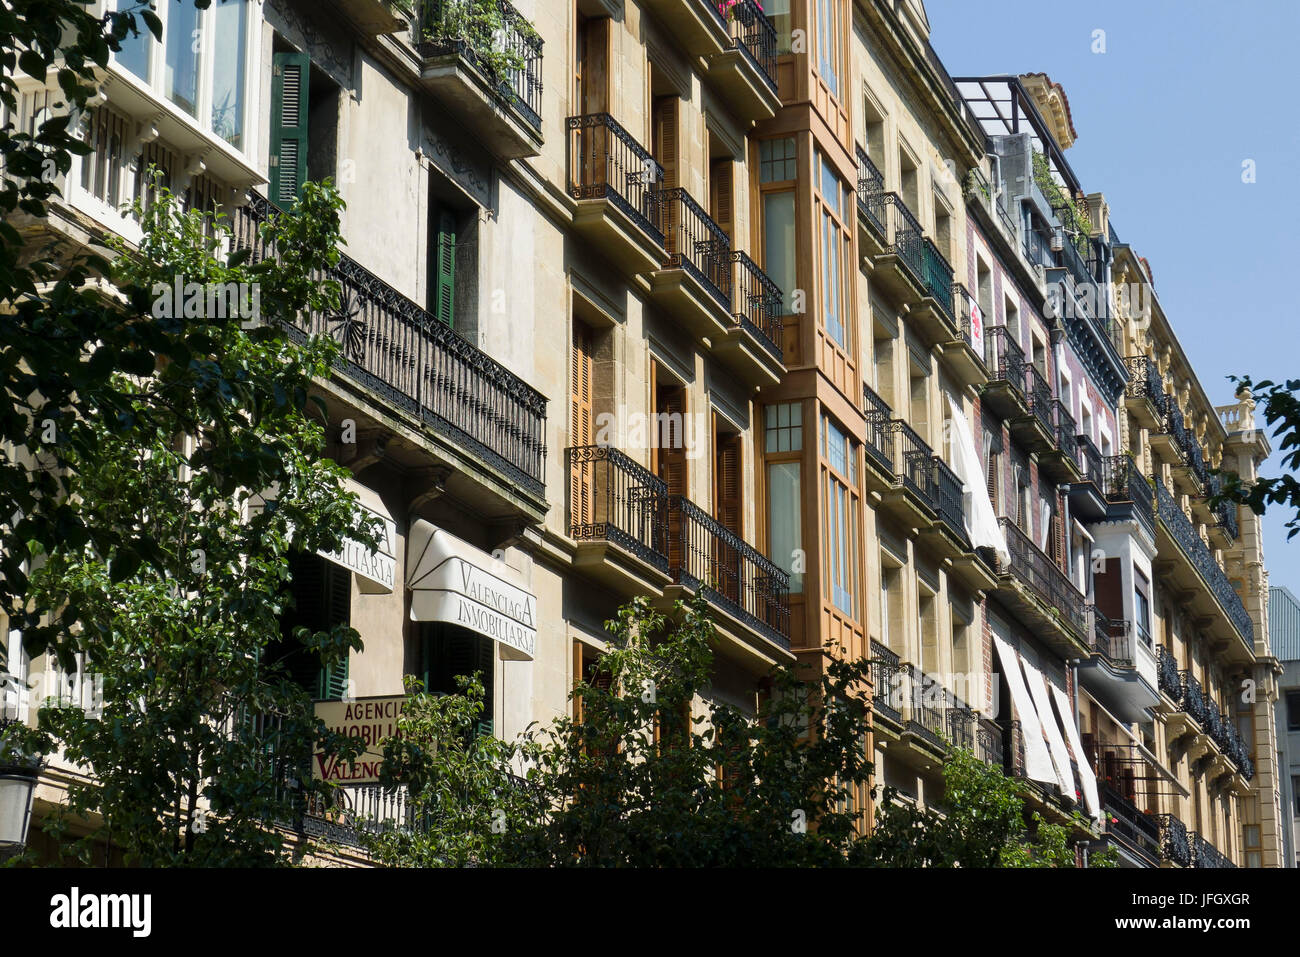 City centre, Donostia-San Sebastián, Gipuzkoa, the Basque Provinces, Spain - Stock Image